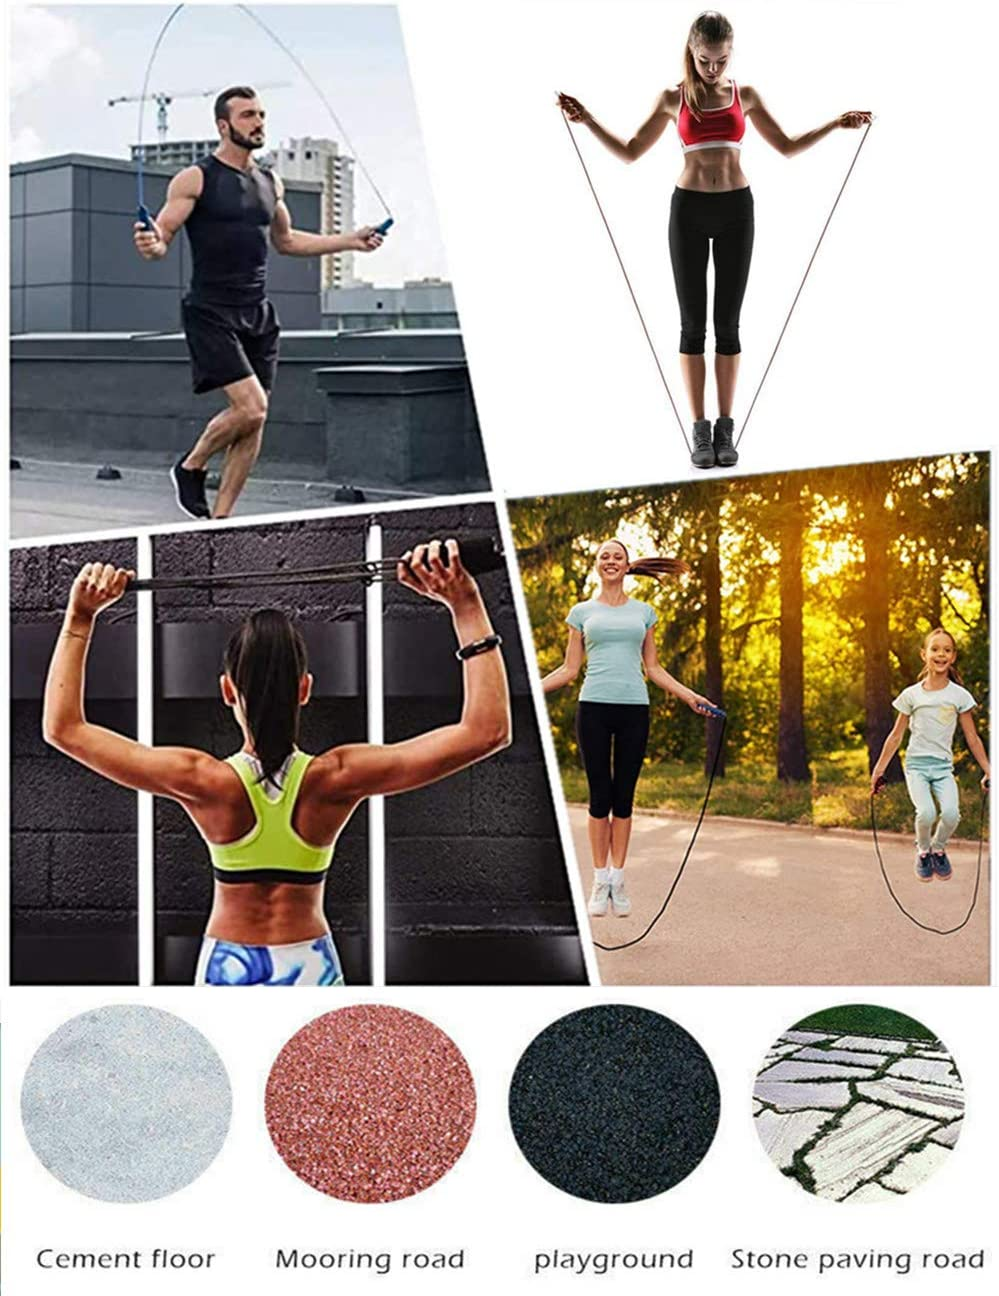 Crossfit,Profi Sport Ausdauer /& Abnehmen Springseil 2.8M Rope L/änge verstellbaren Springseil Kinder und Springseil Erwachsene F/ür Fitness,Workout